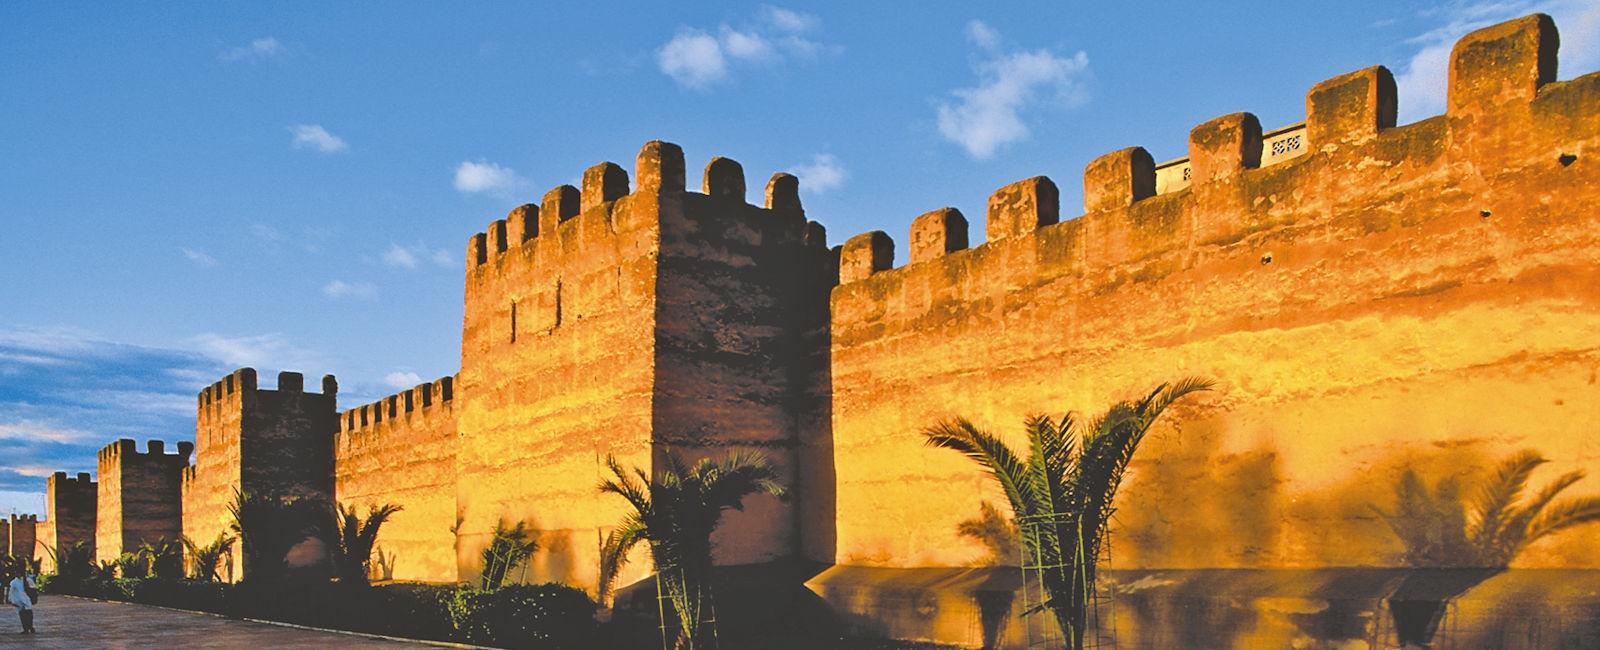 Morocco second image